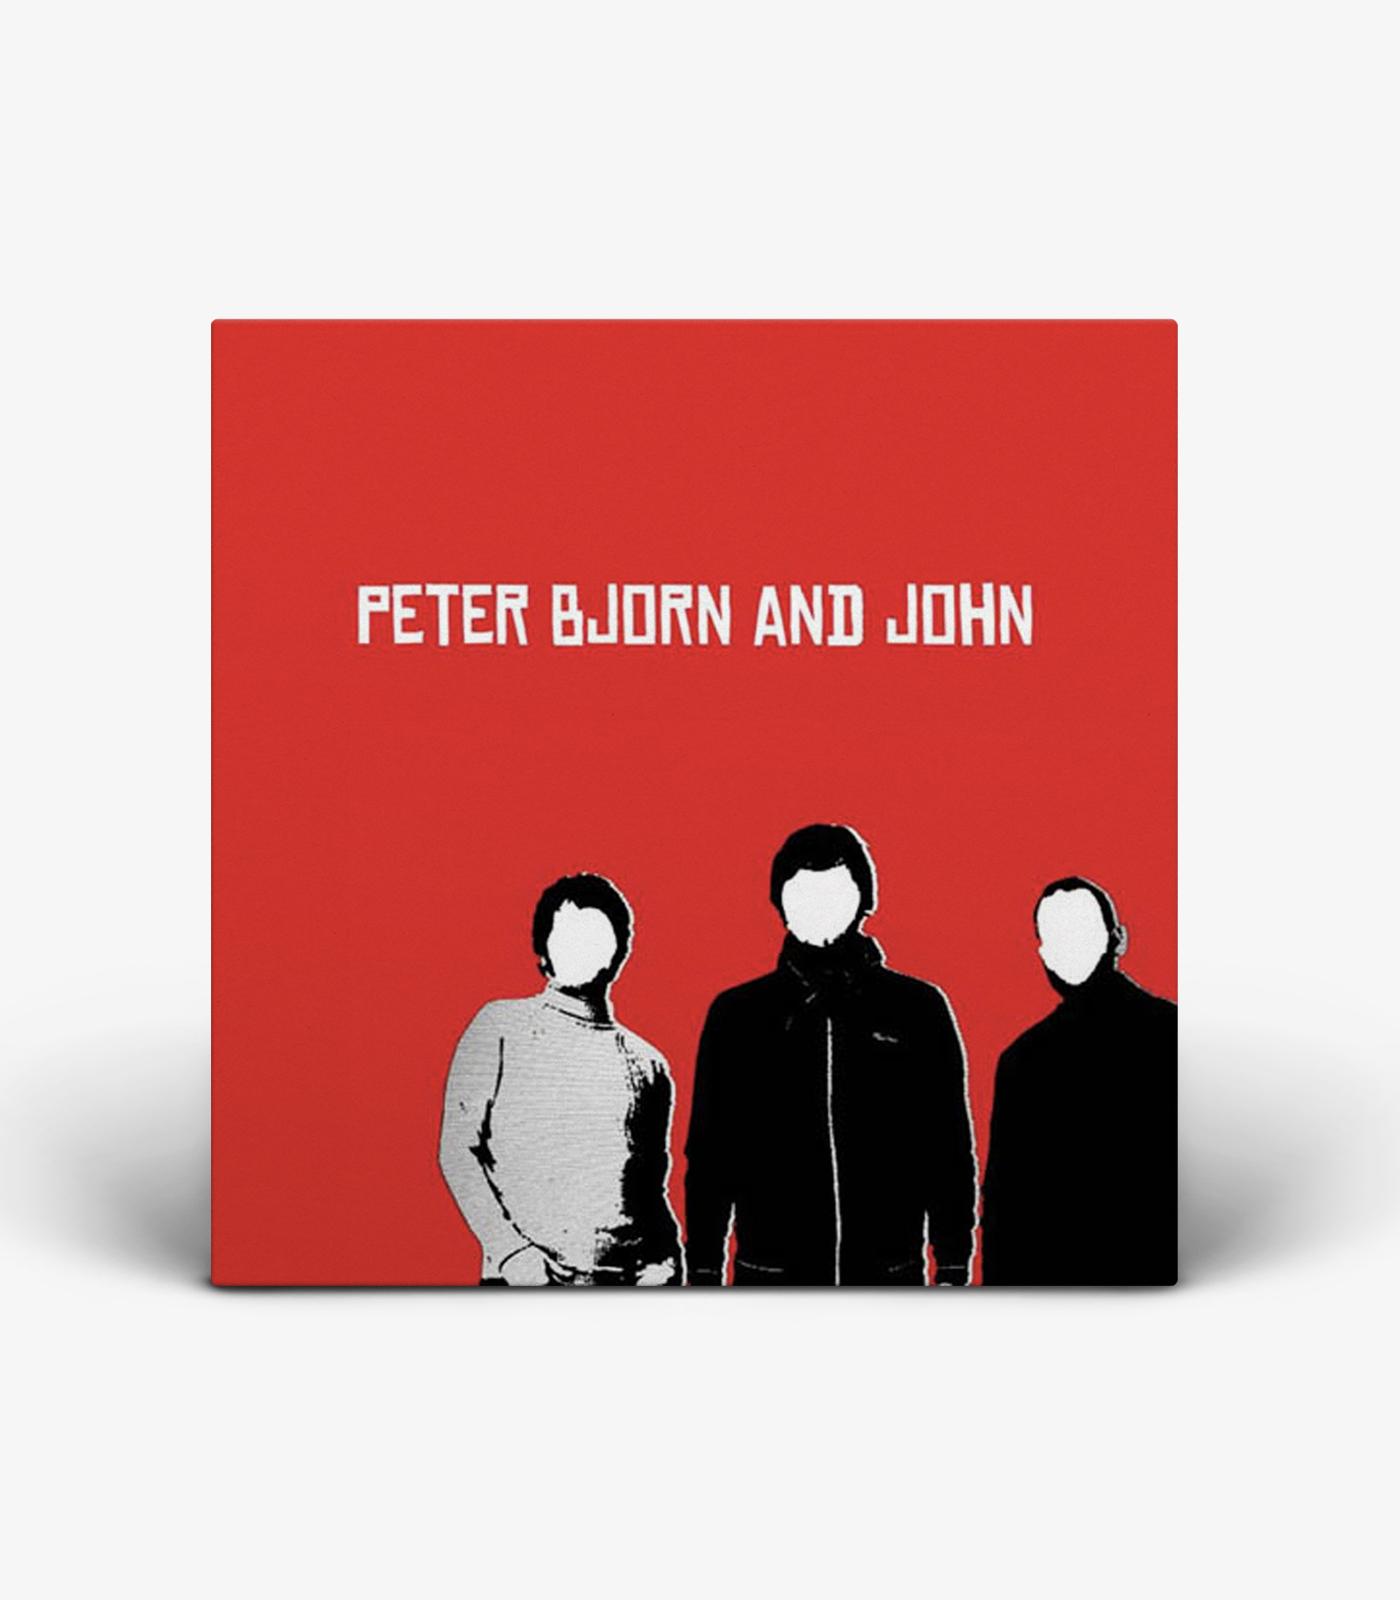 Peter Bjorn and John Vinyl